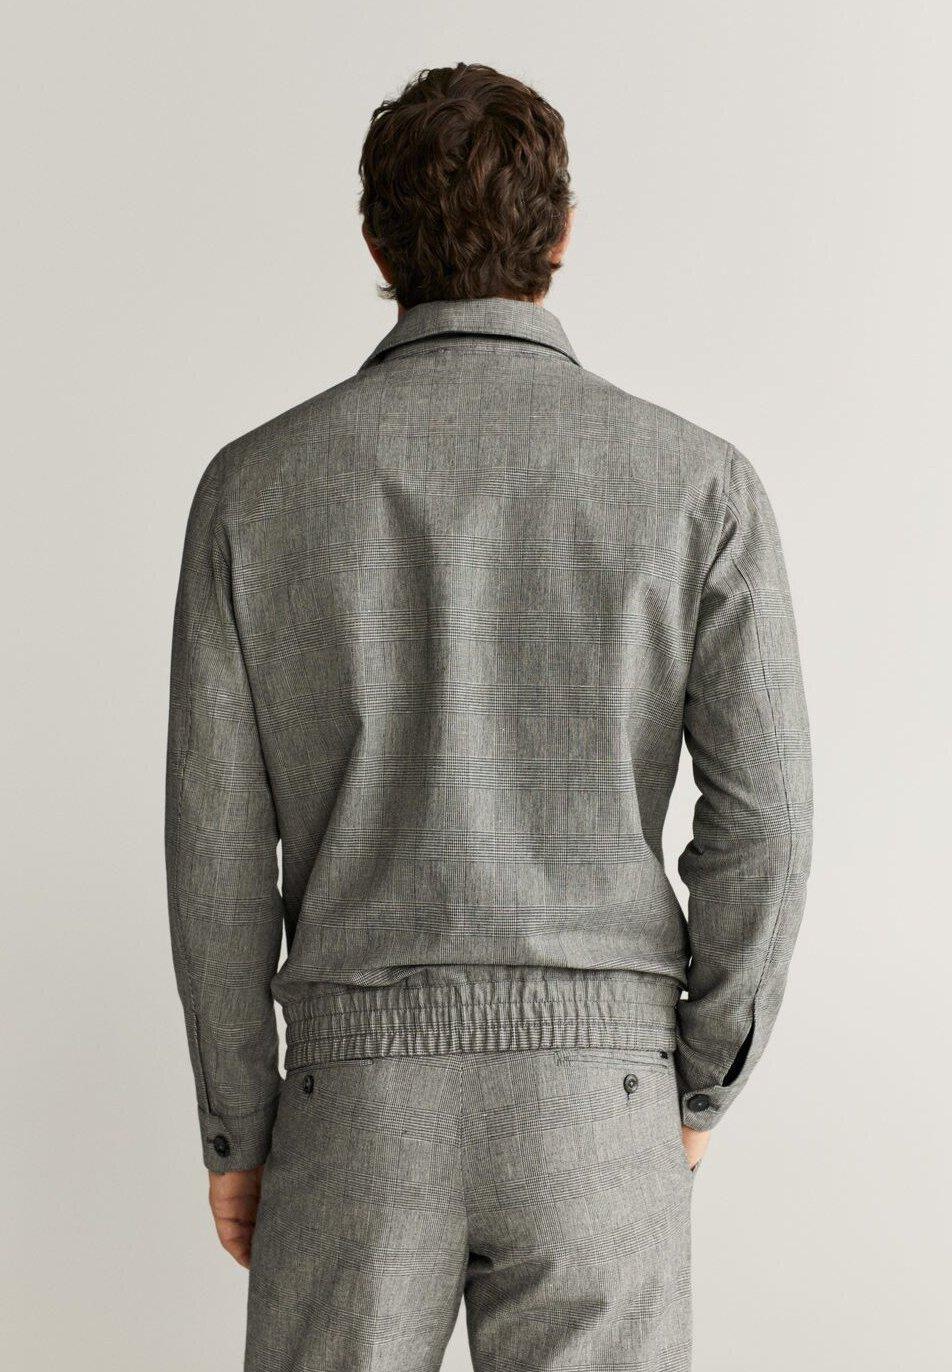 Mango BELAIR - Allvädersjacka - mittelgrau meliert - Herrkläder Rabatter